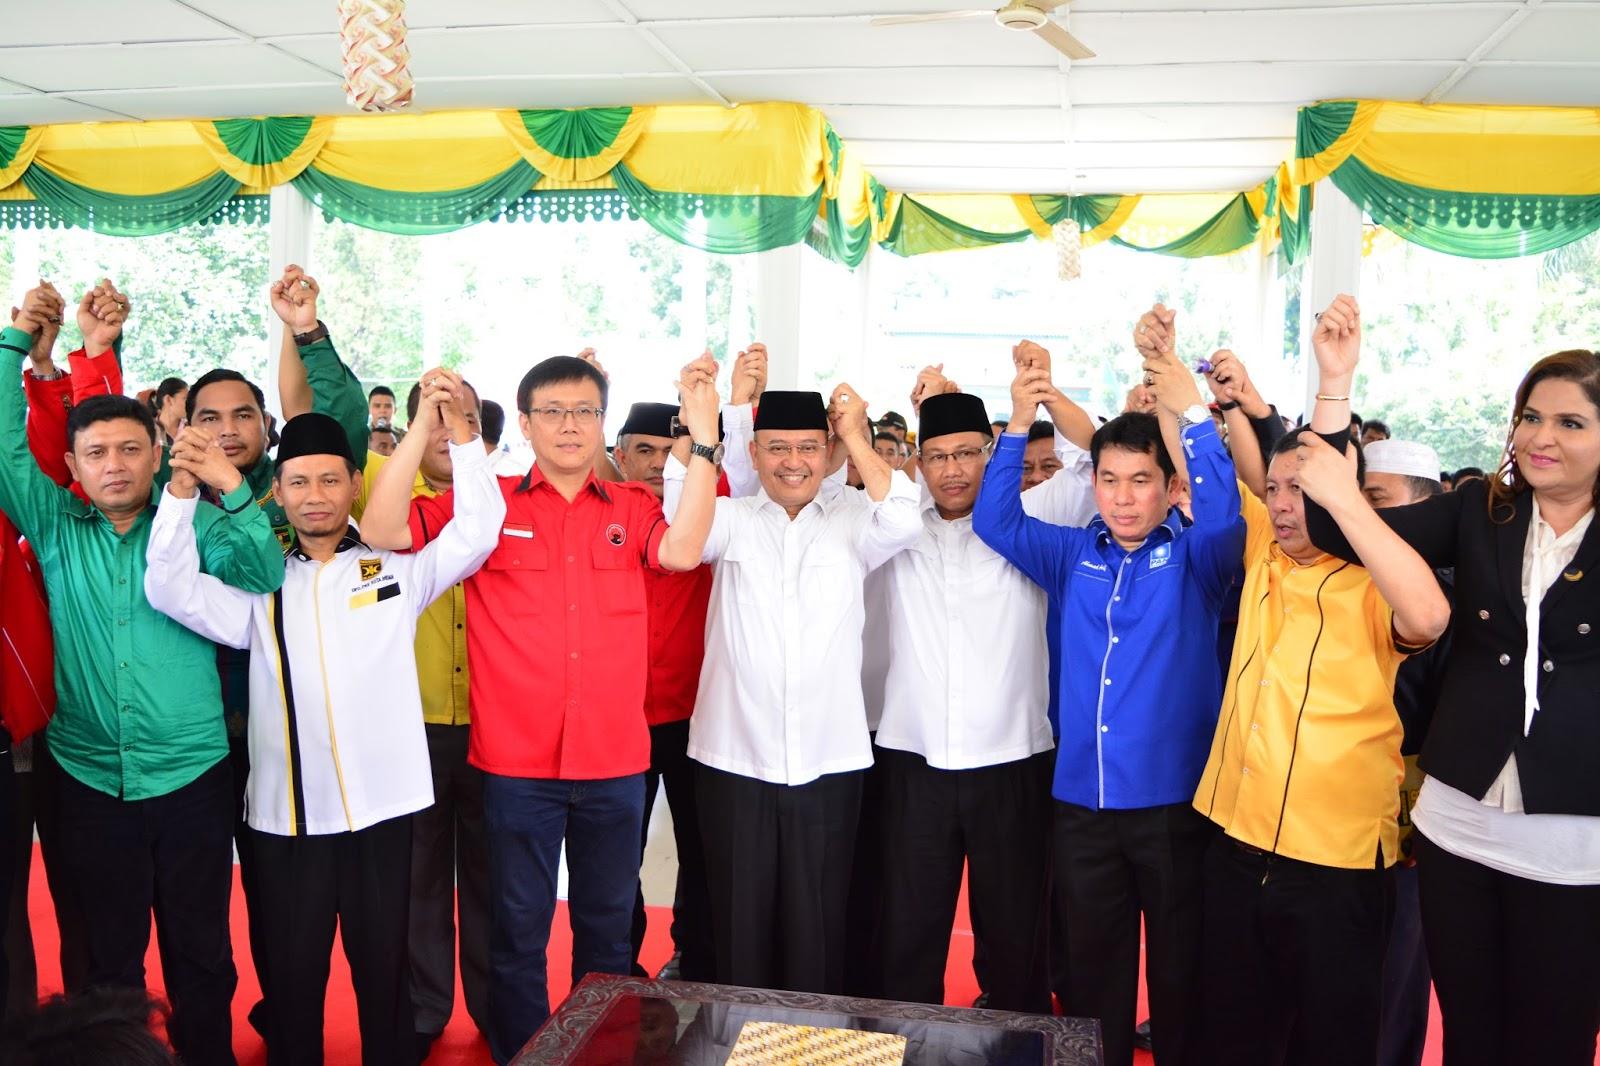 Partai Pendukung Deklarasikan Pasangan Dzulmi Eldin Akhyar Produk Ukm Bumn Keset Our House Nasution